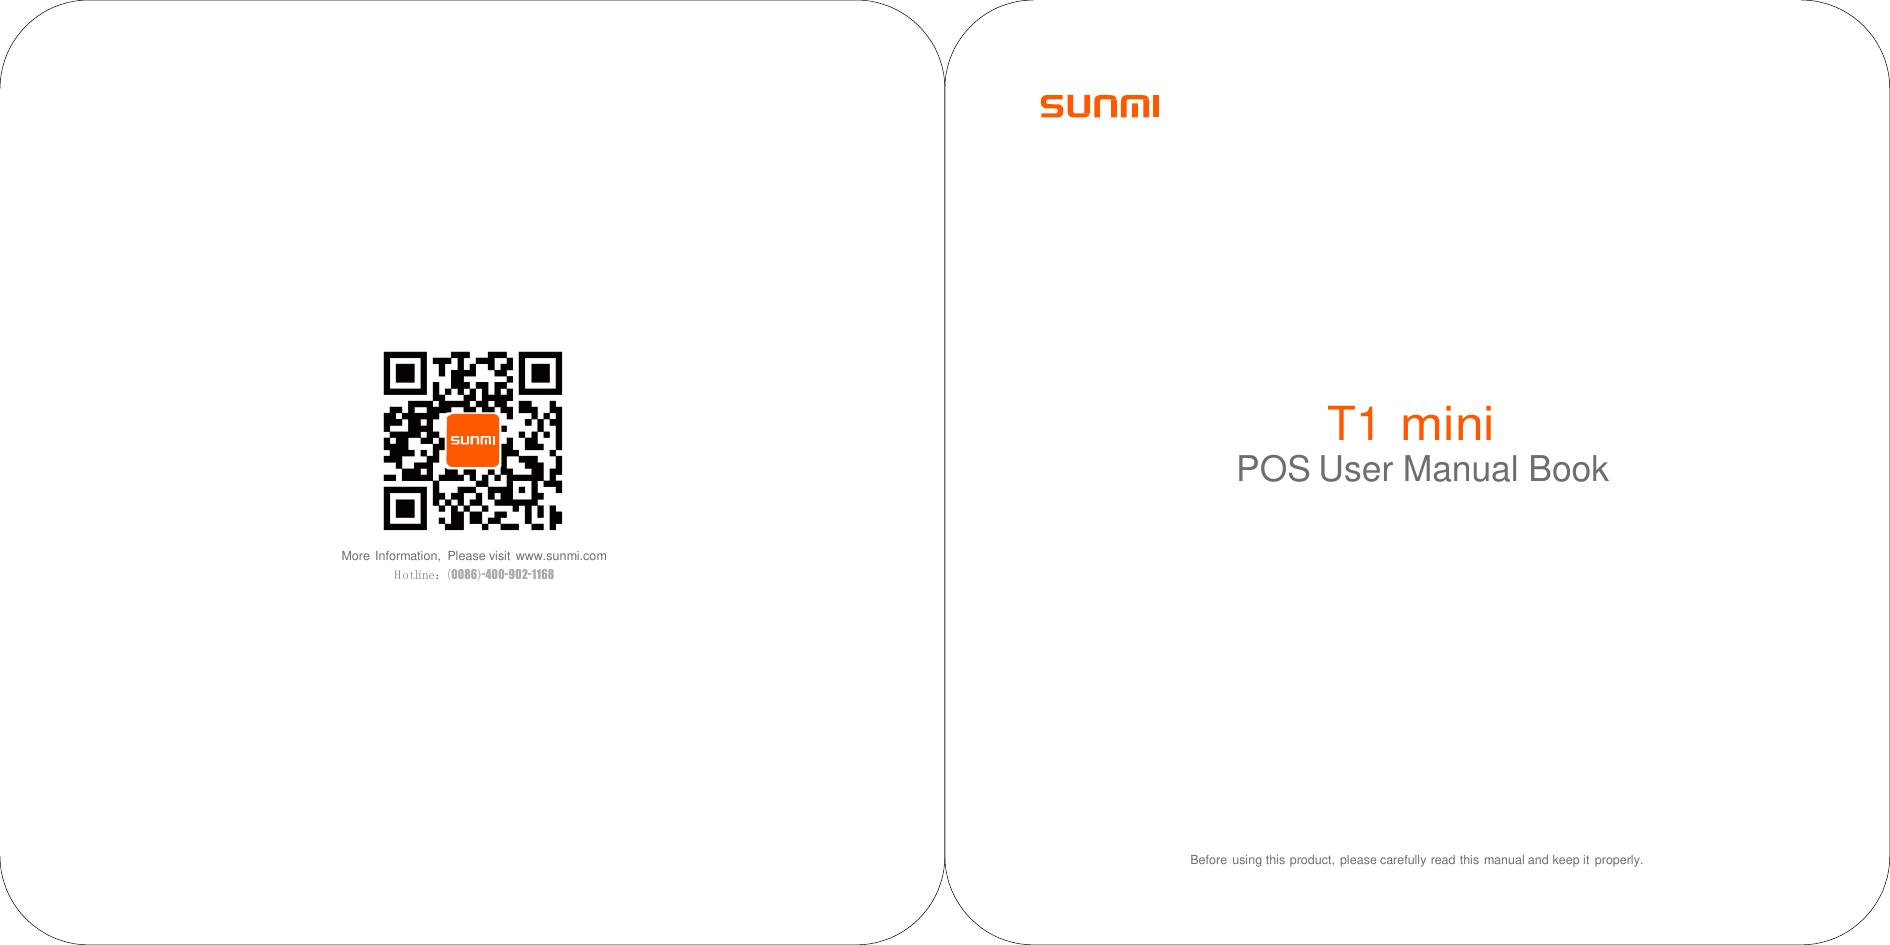 Sunmi Technology W1300 POS System User Manual W1300W1302 04 T1 mini